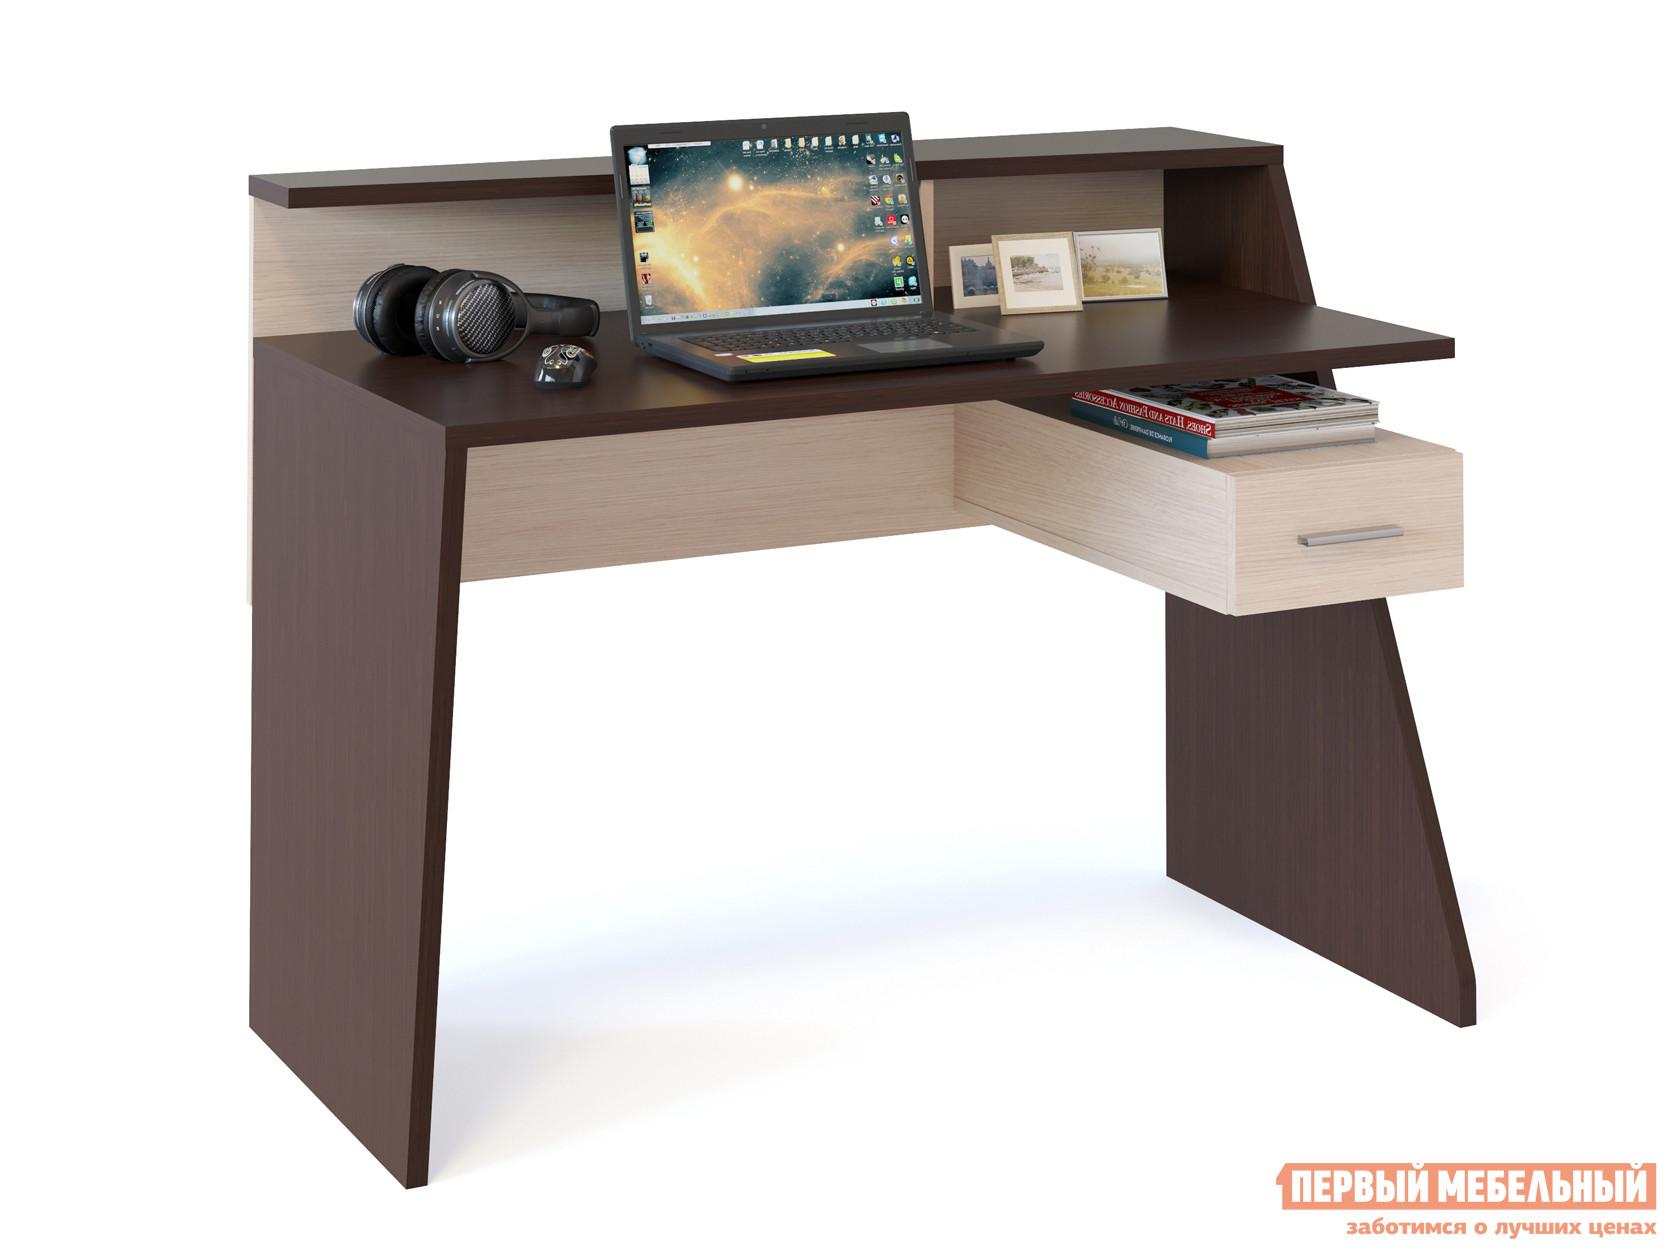 Компьютерный стол Сокол КСТ-108 цена